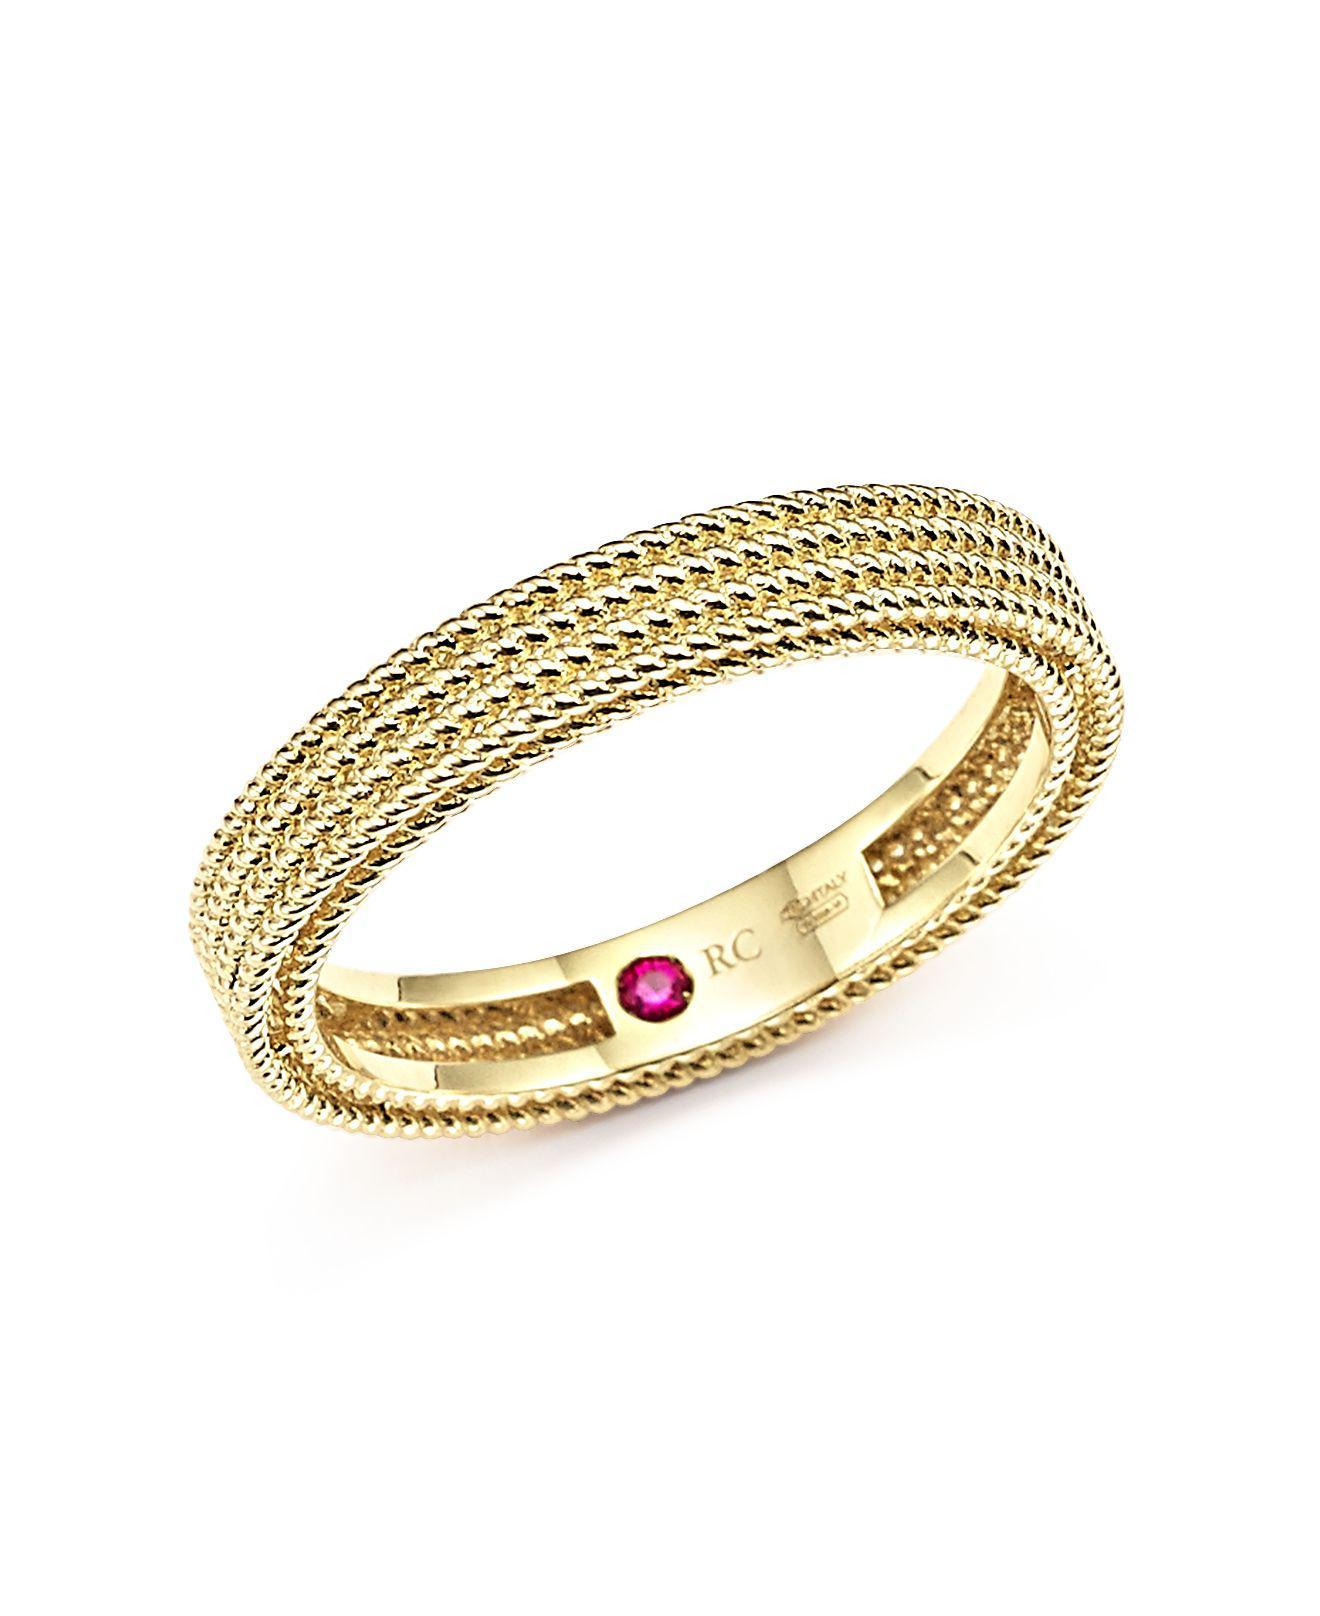 Roberto Coin Barocco Three-Row Diamond Bracelet in 18K Rose Gold 8Zq4qHI6